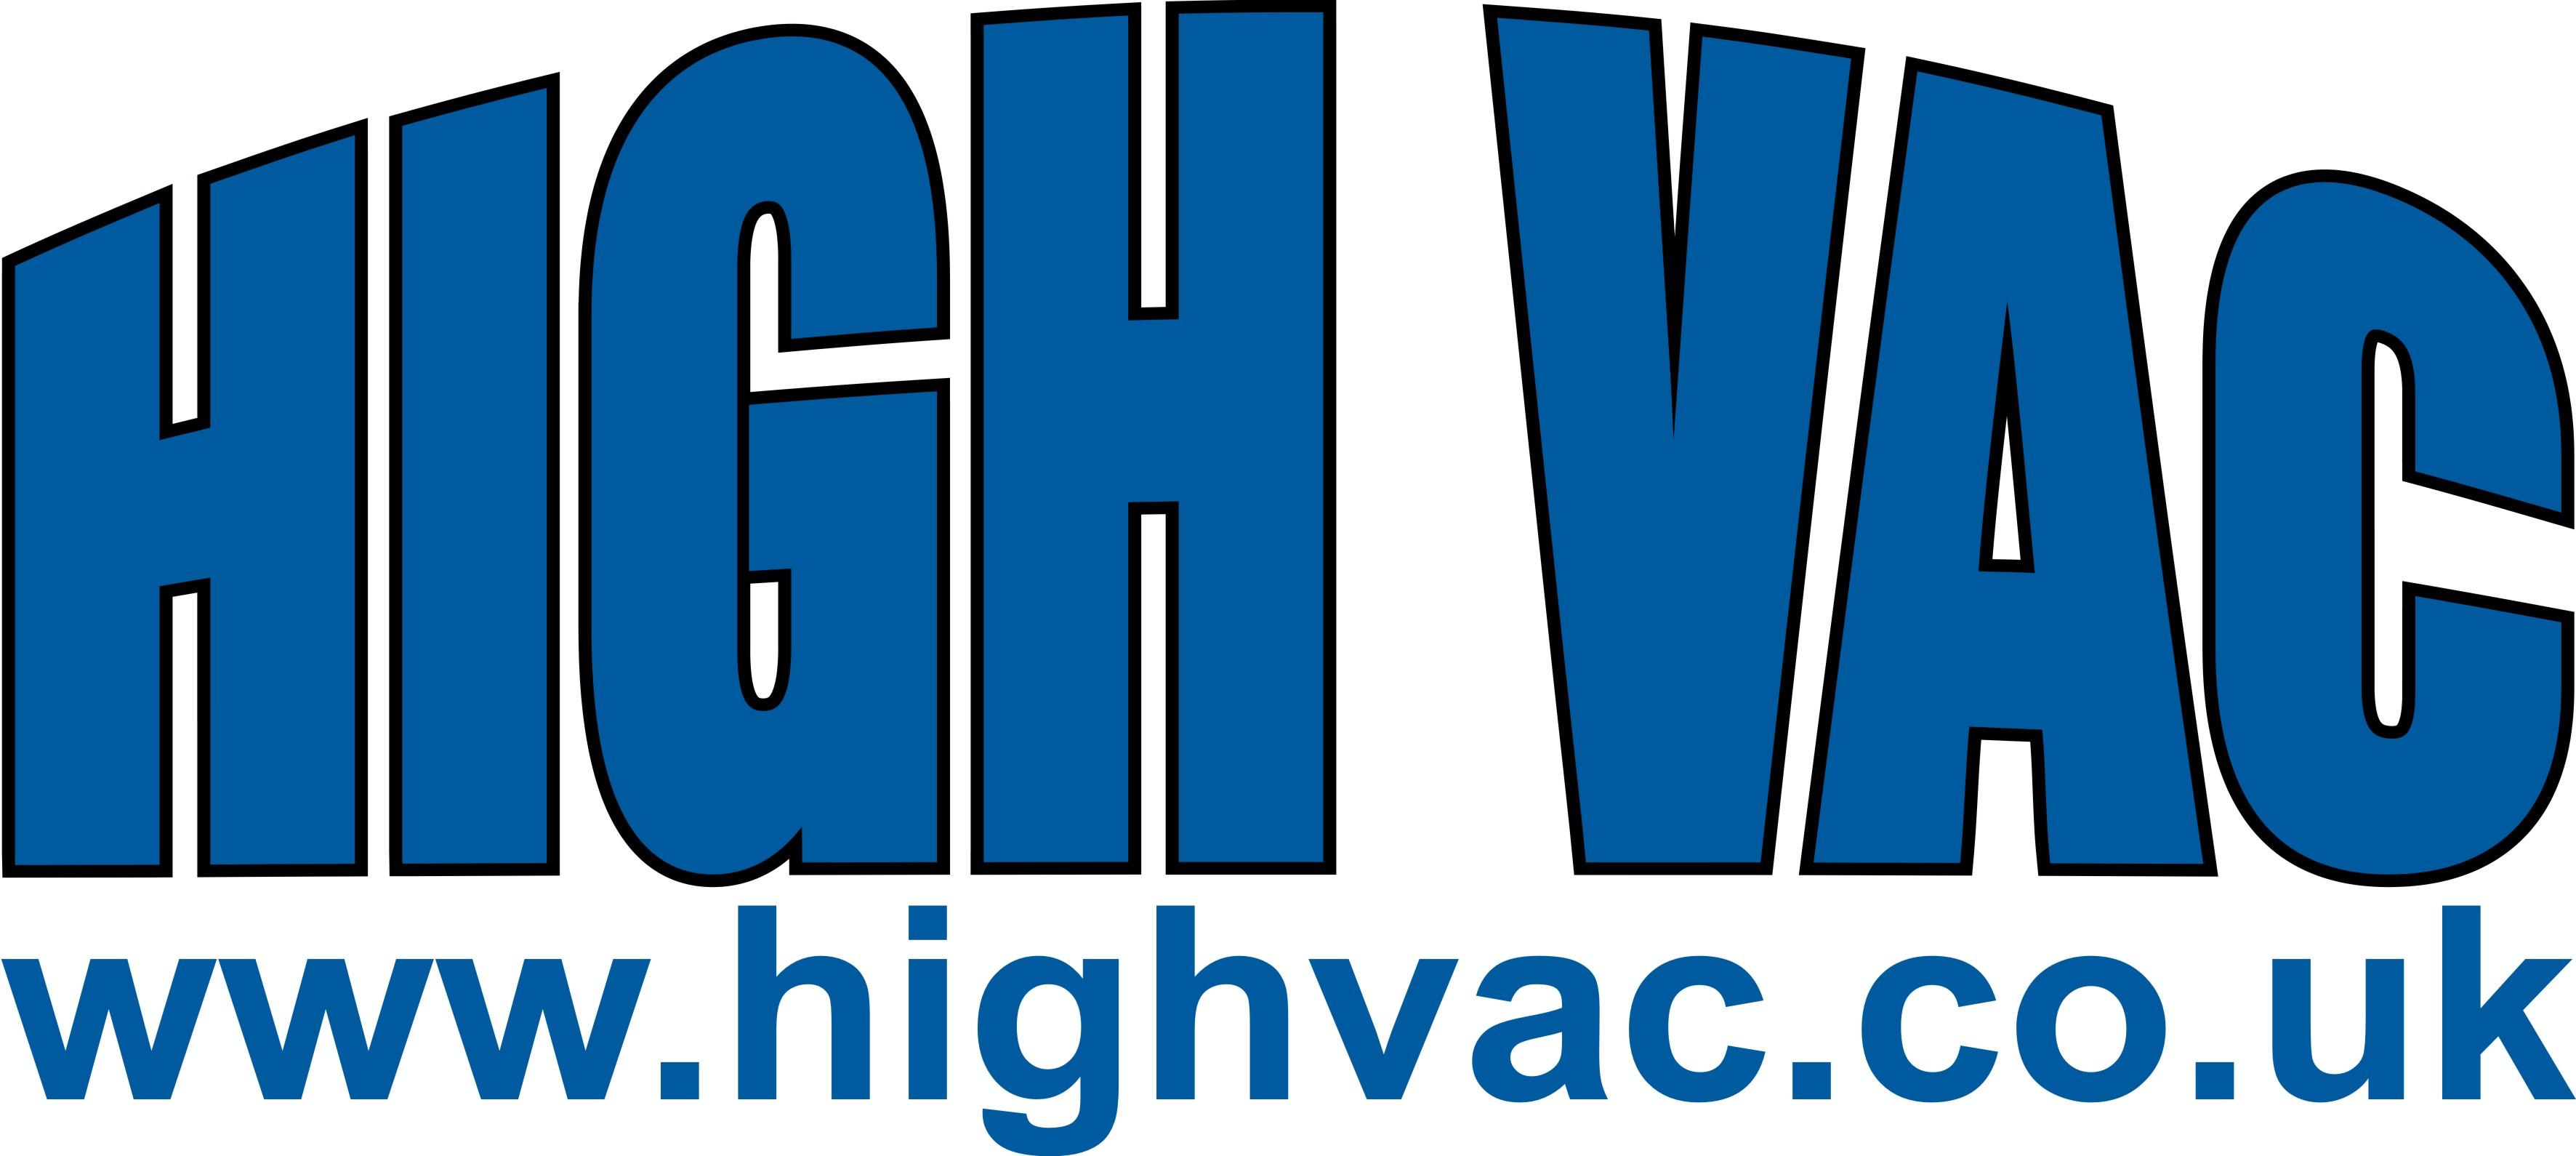 JMC HIGHVAC